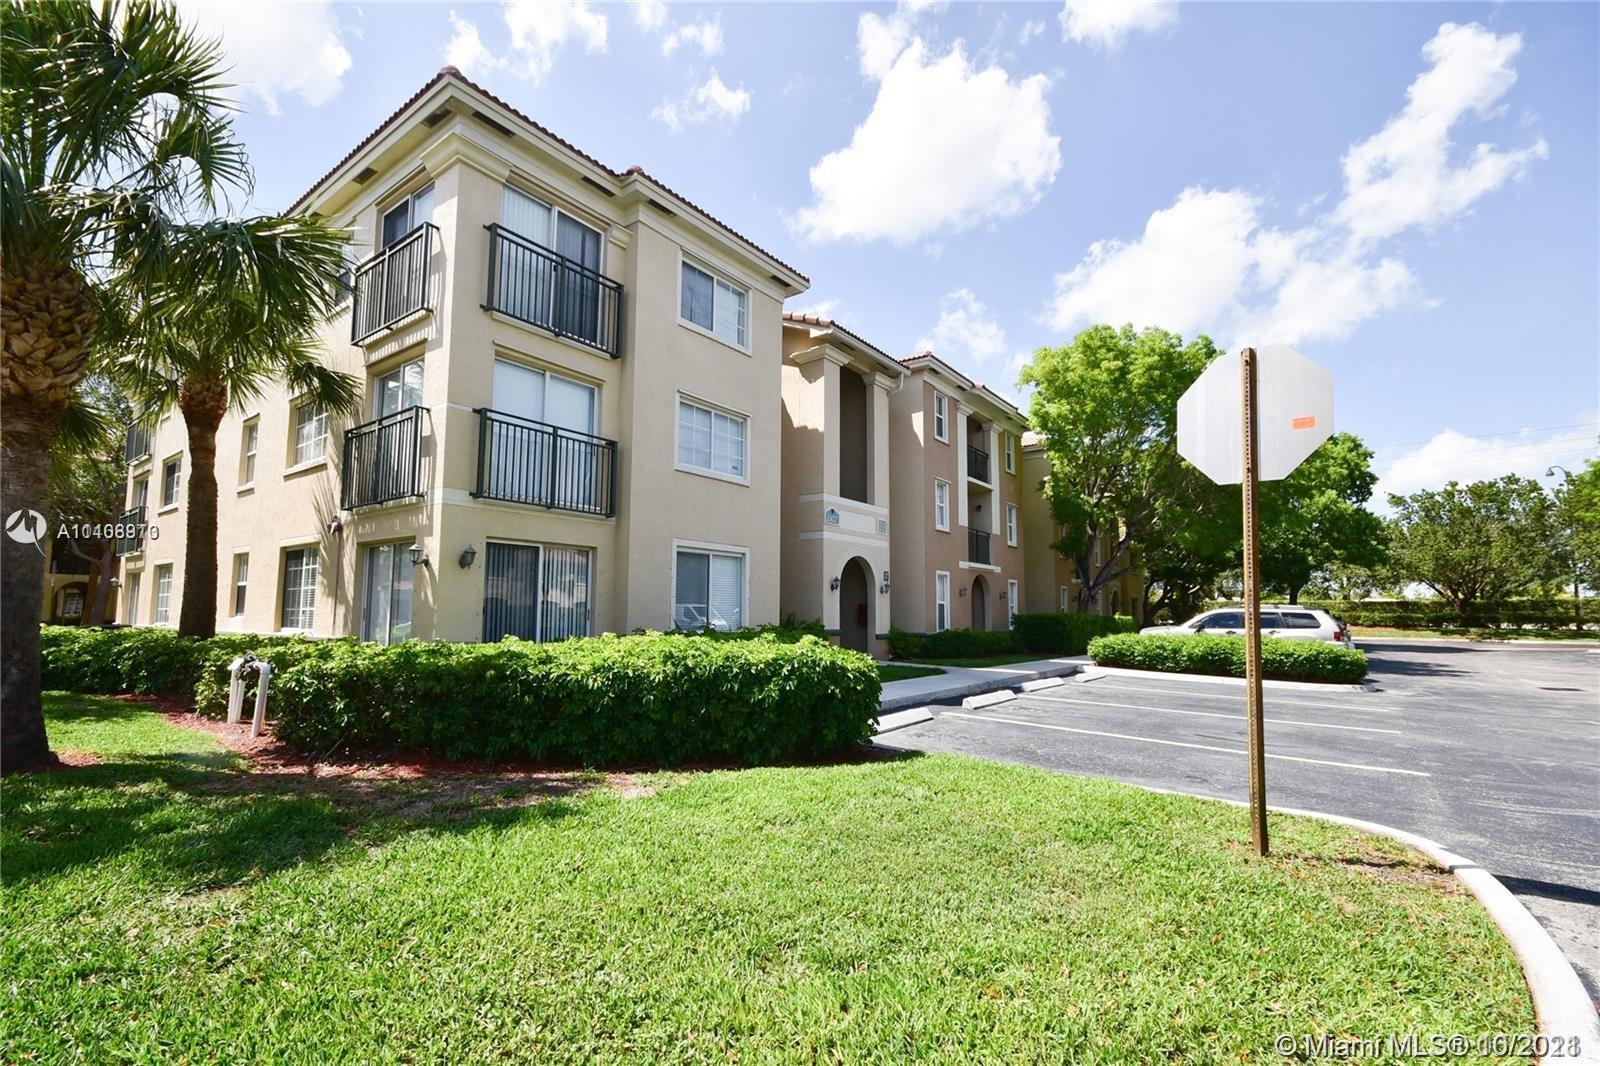 2427 Centergate Dr Unit 306, Miramar, Florida 33025